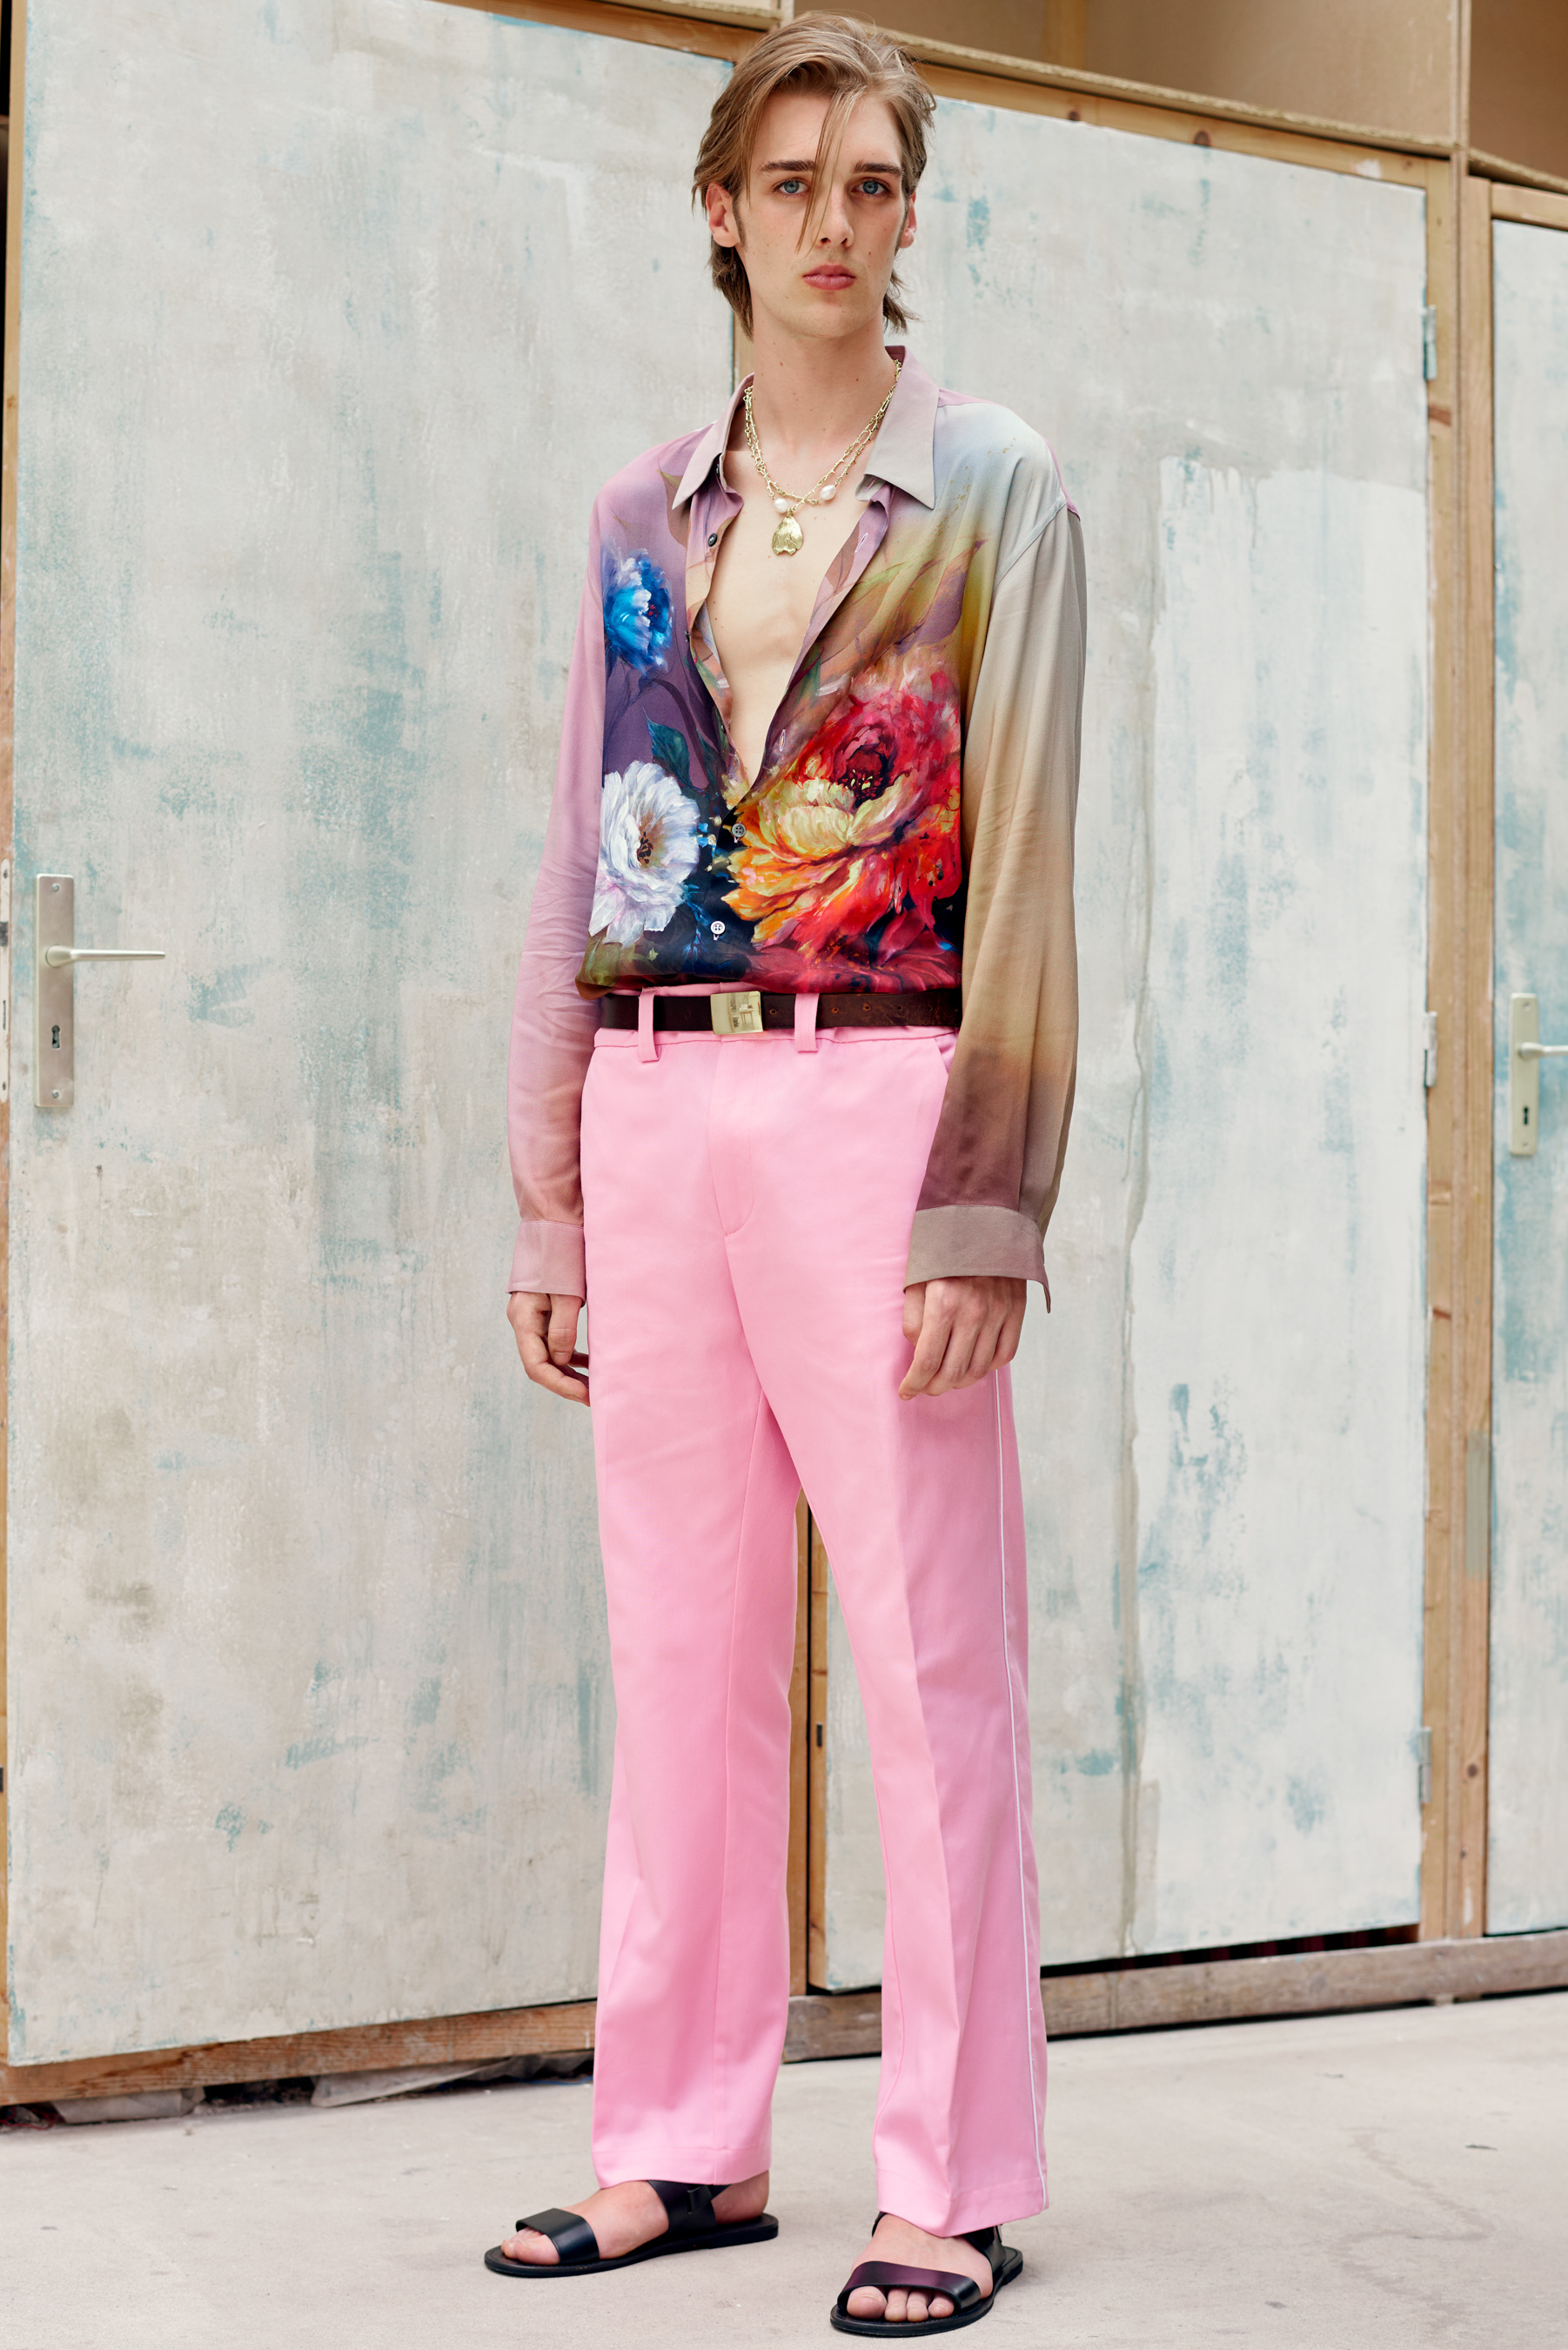 Davi Paris Spring 2022 Men's  Fashion Show